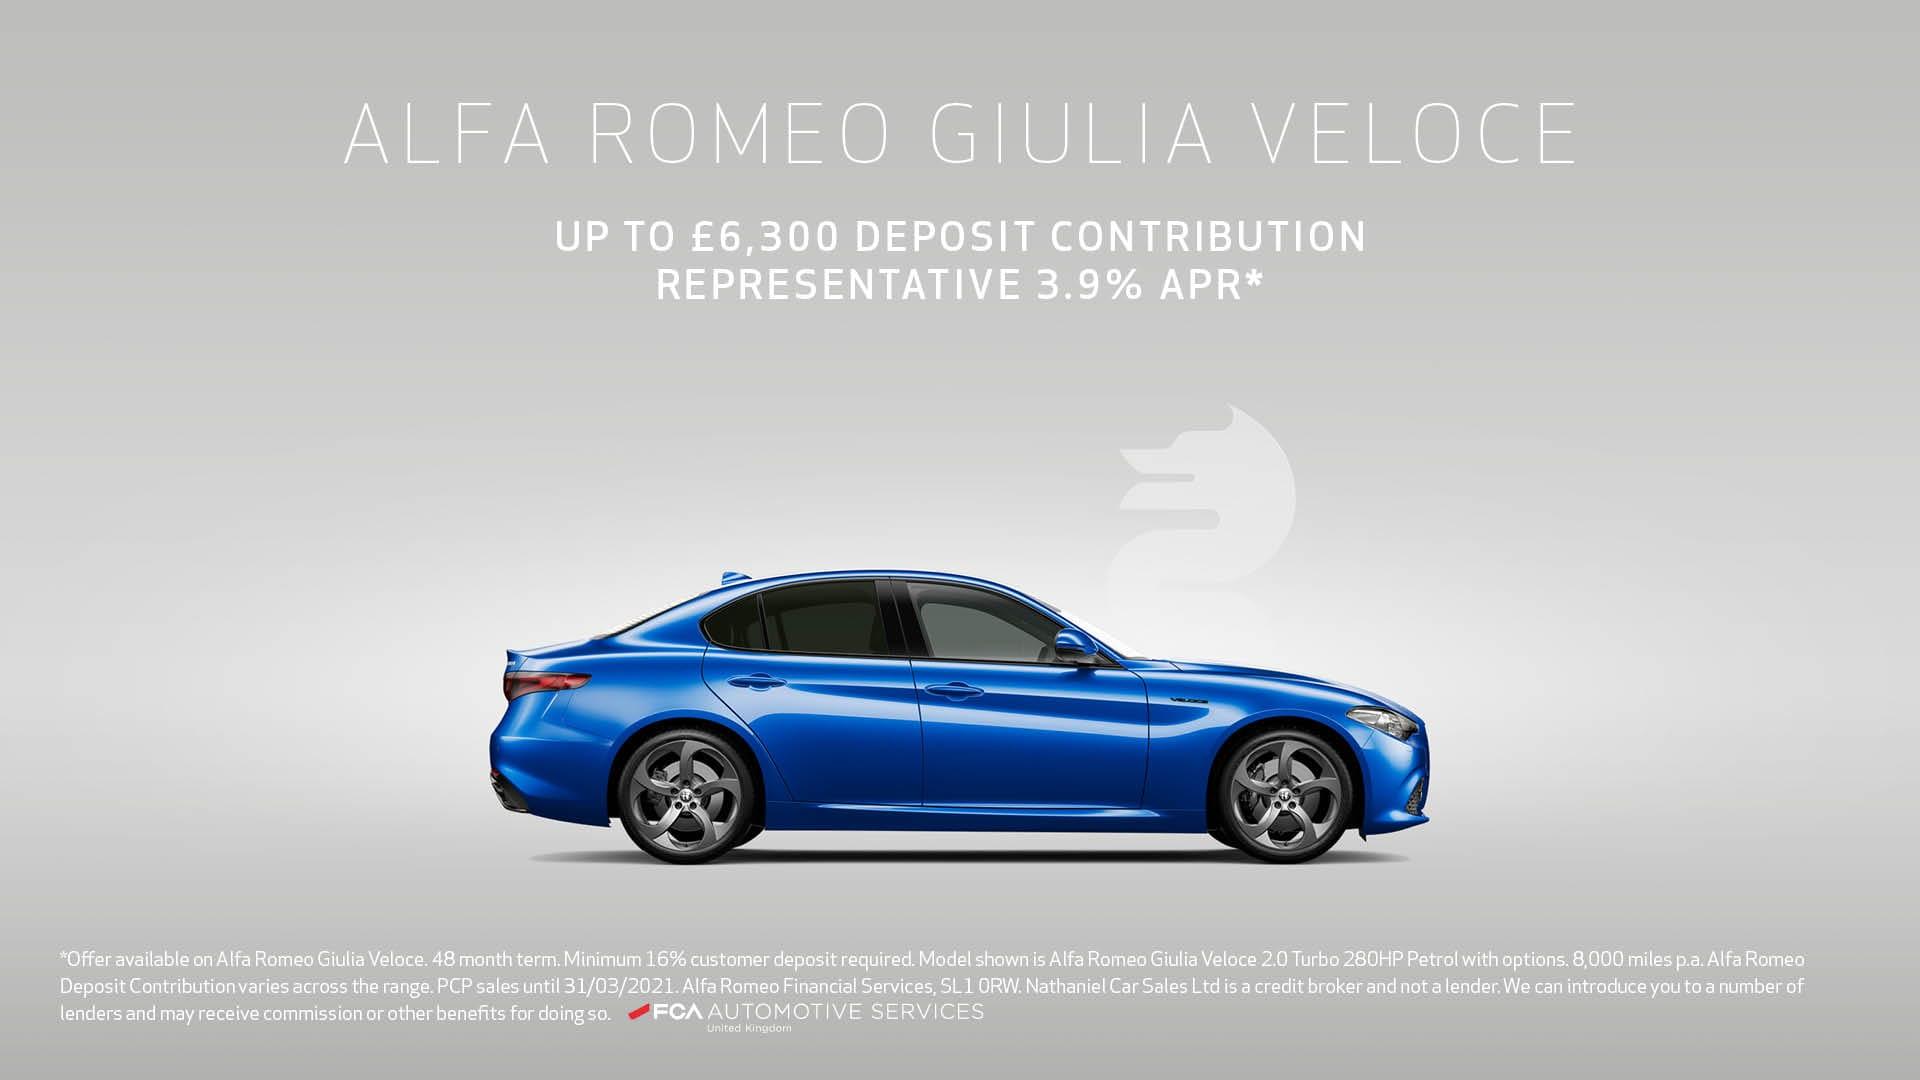 Q1 2021 Alfa Romeo - Giulia Veloce PCP - Website banner - 1920 x 1080